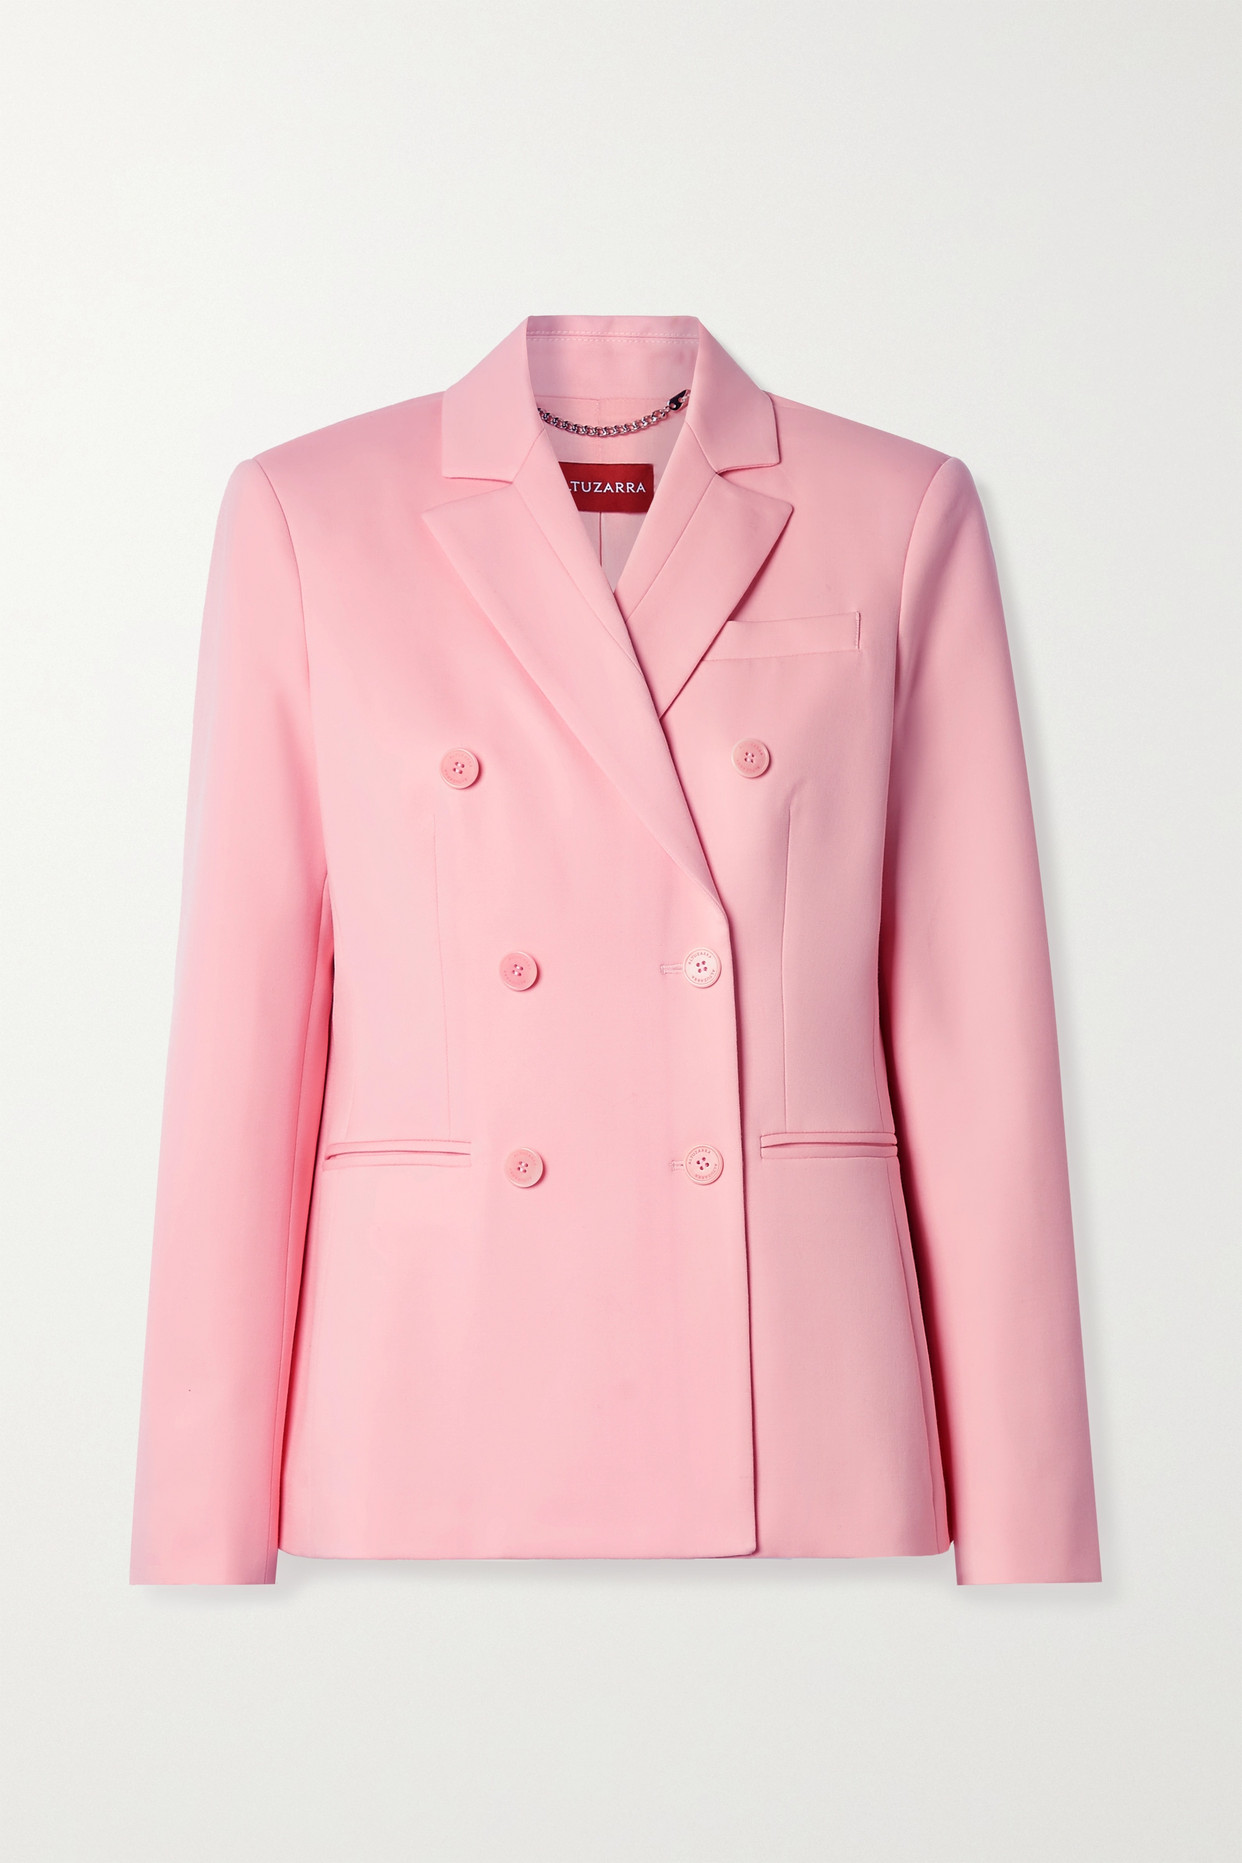 ALTUZARRA - Ana 双排扣羊毛混纺西装外套 - 粉红色 - IT42